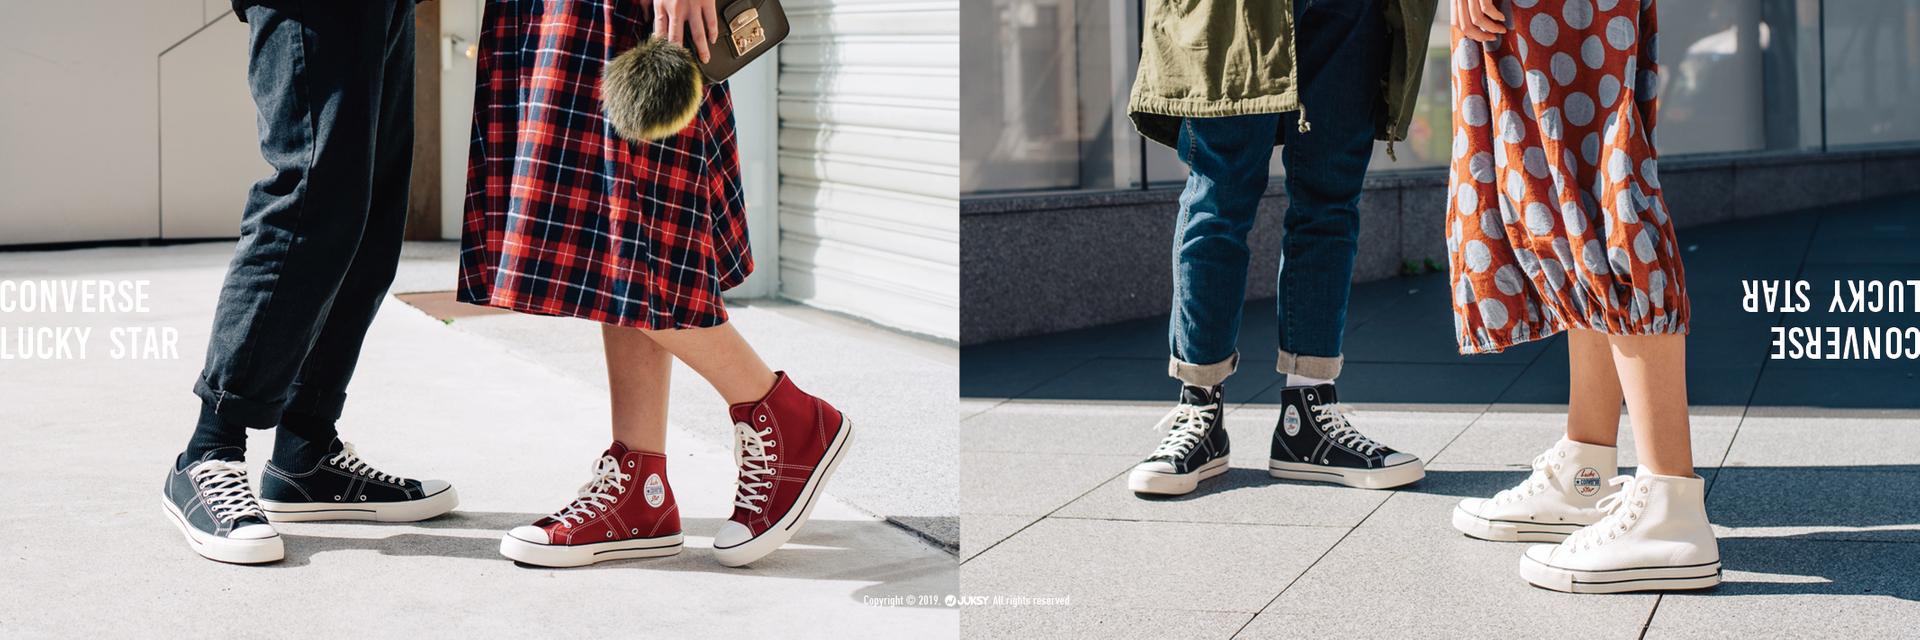 CONVERSE 鞋迷警報大響!極稀有指標性鞋款 Lucky Star 登場,只有「這裡」買得到!